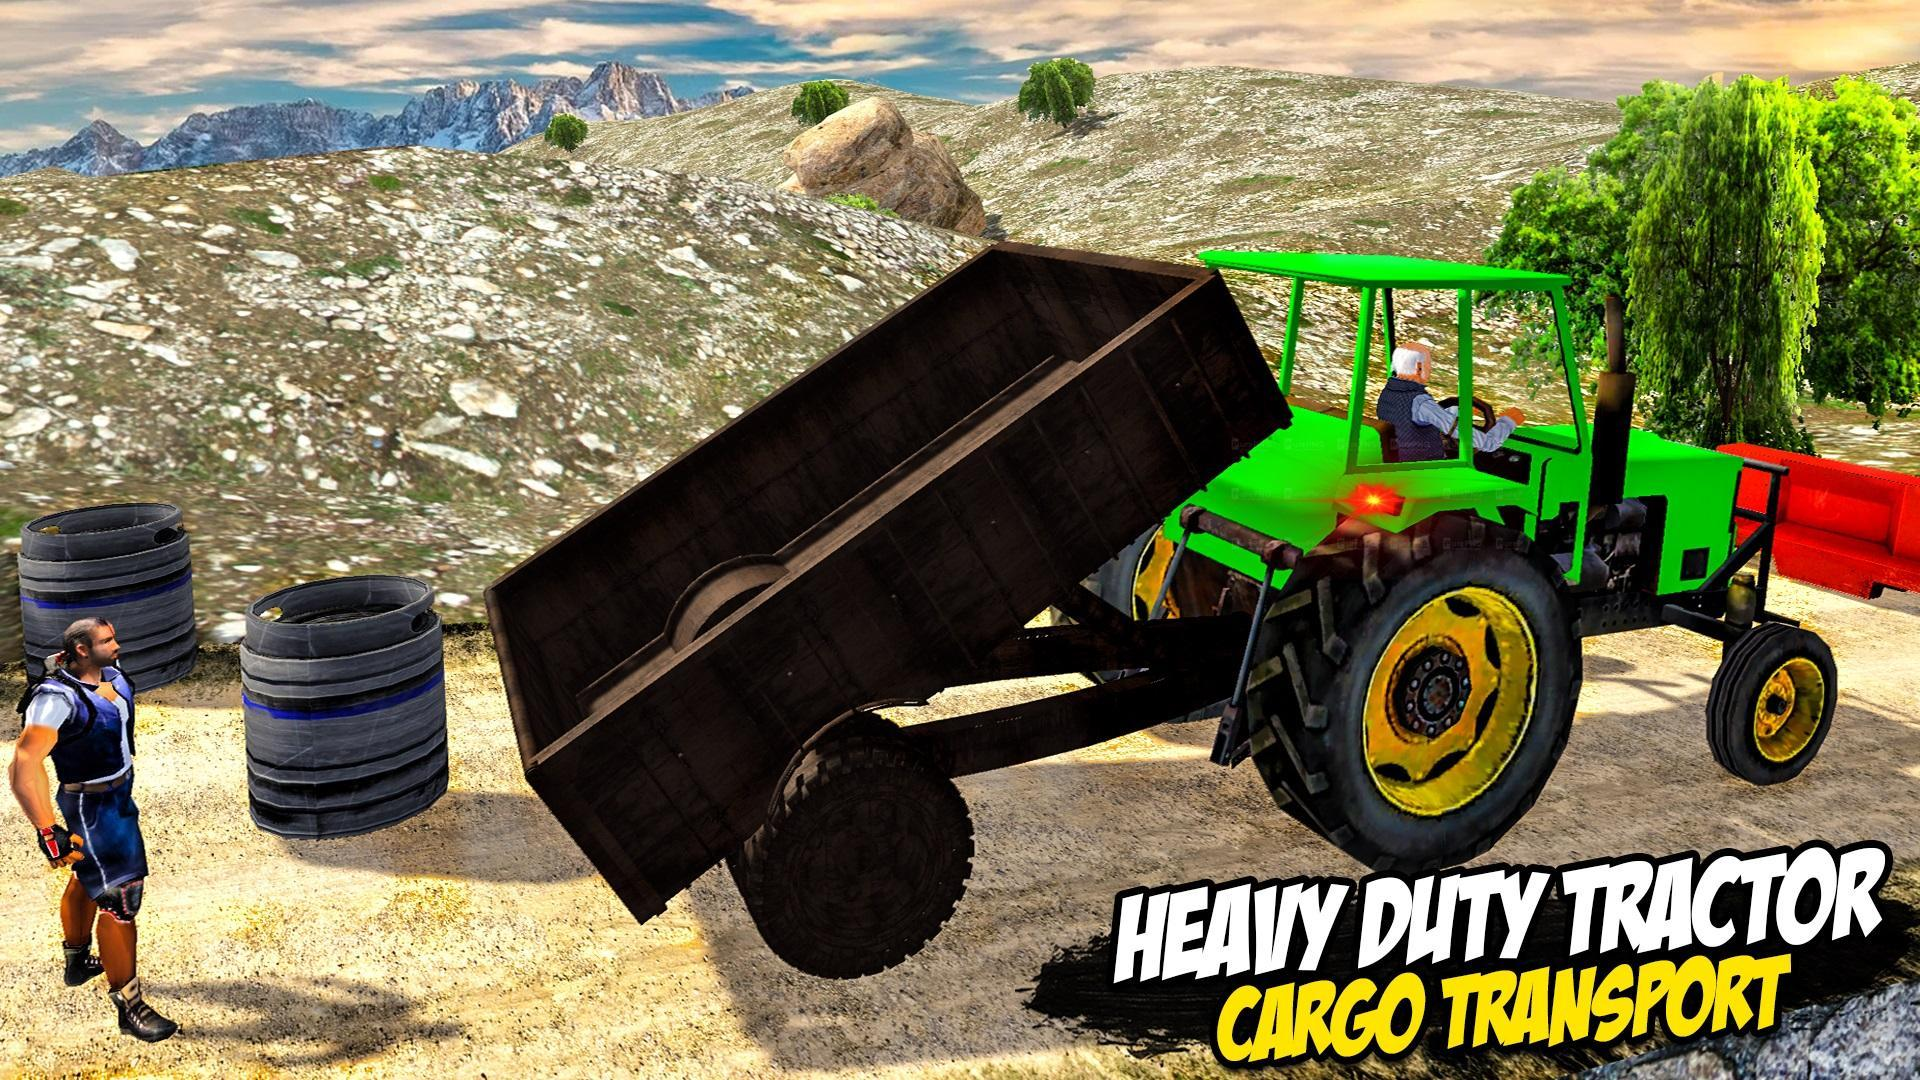 Heavy Tractor Trolley: Tractor Cargo Simulator🚜🚜 3.1 Screenshot 6